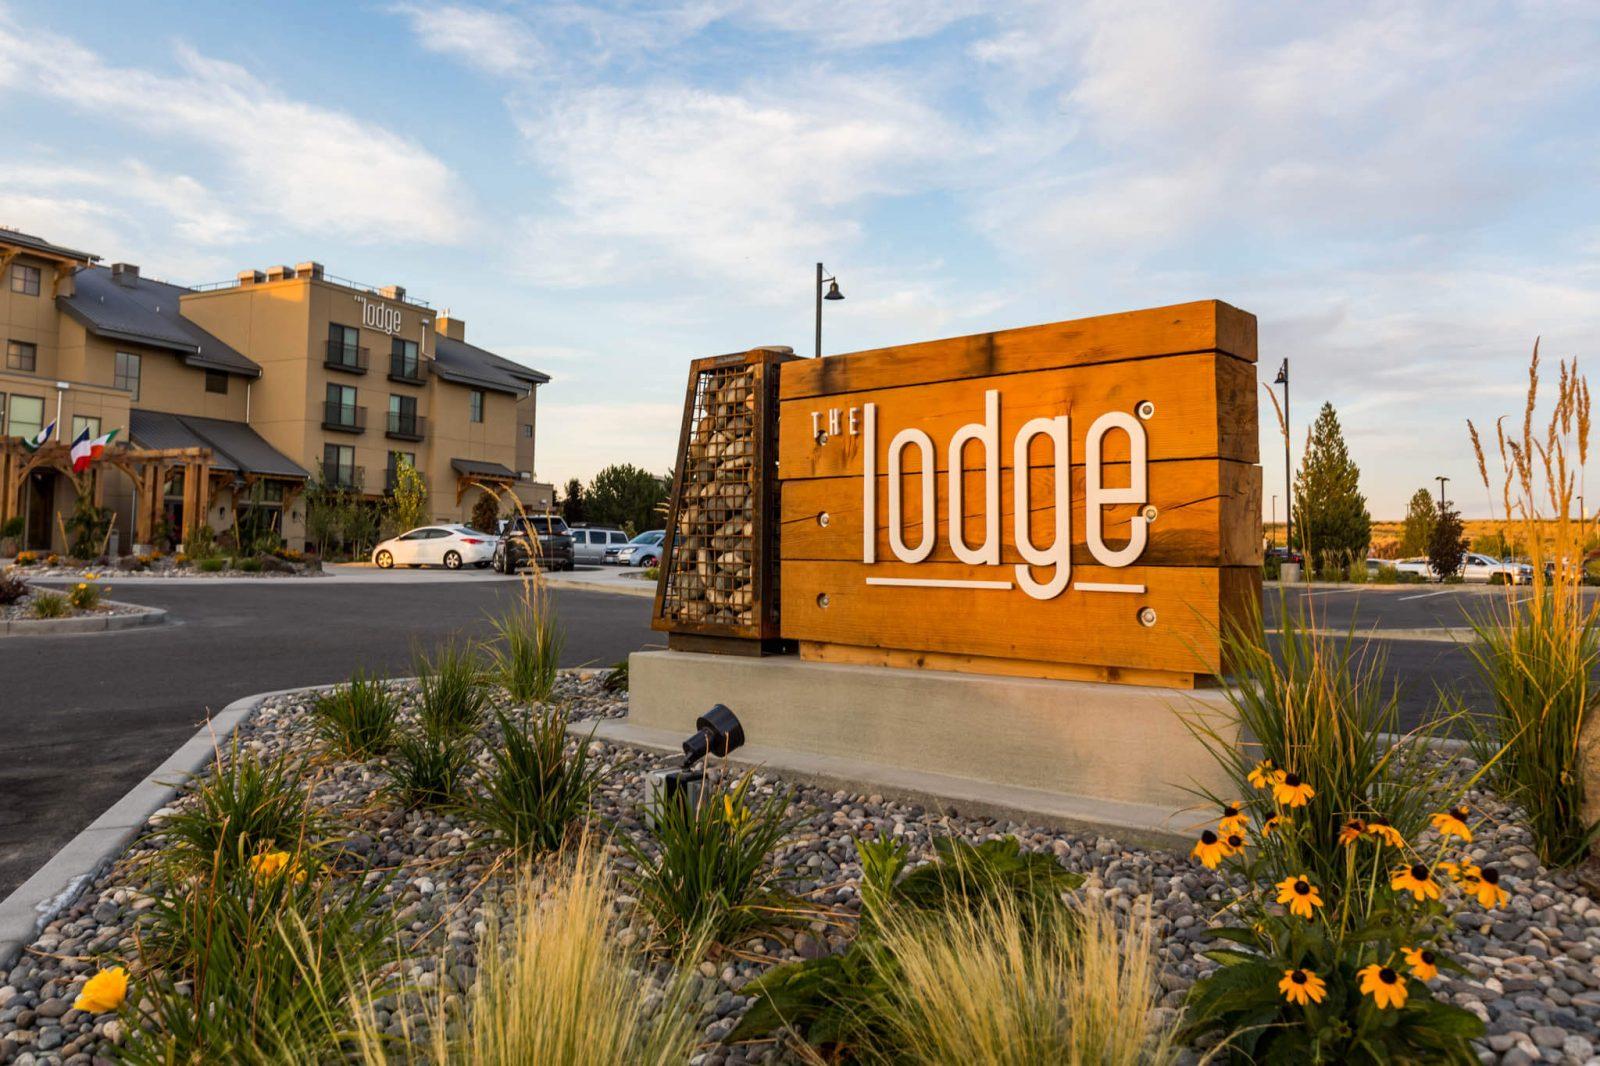 Lodge at Columbia Point in Richland, Washington